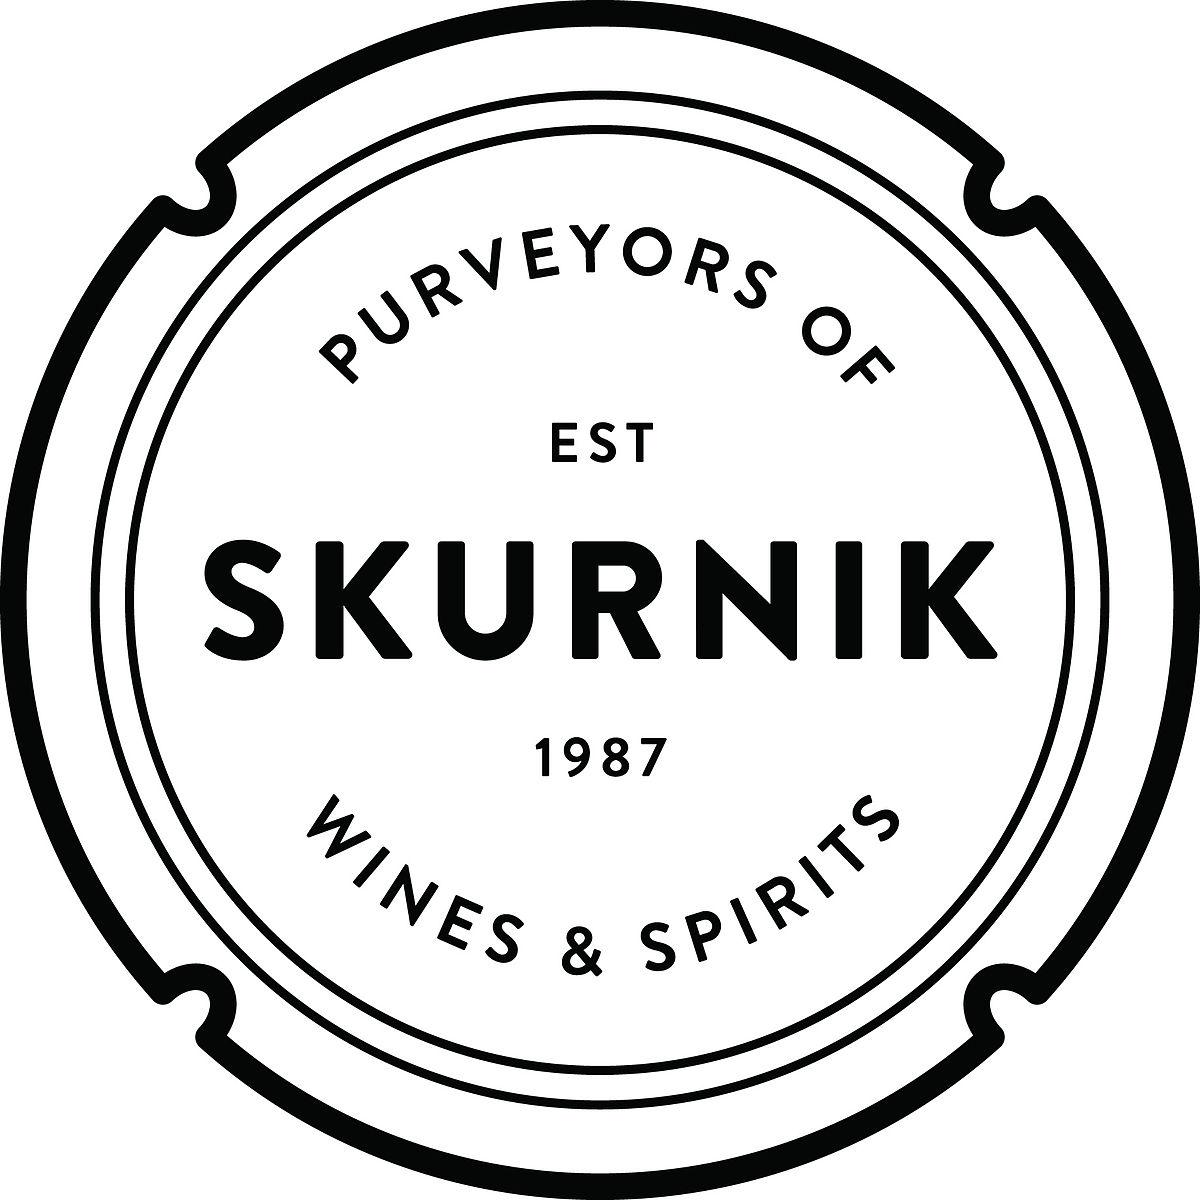 Skurnik Wines & Spirits